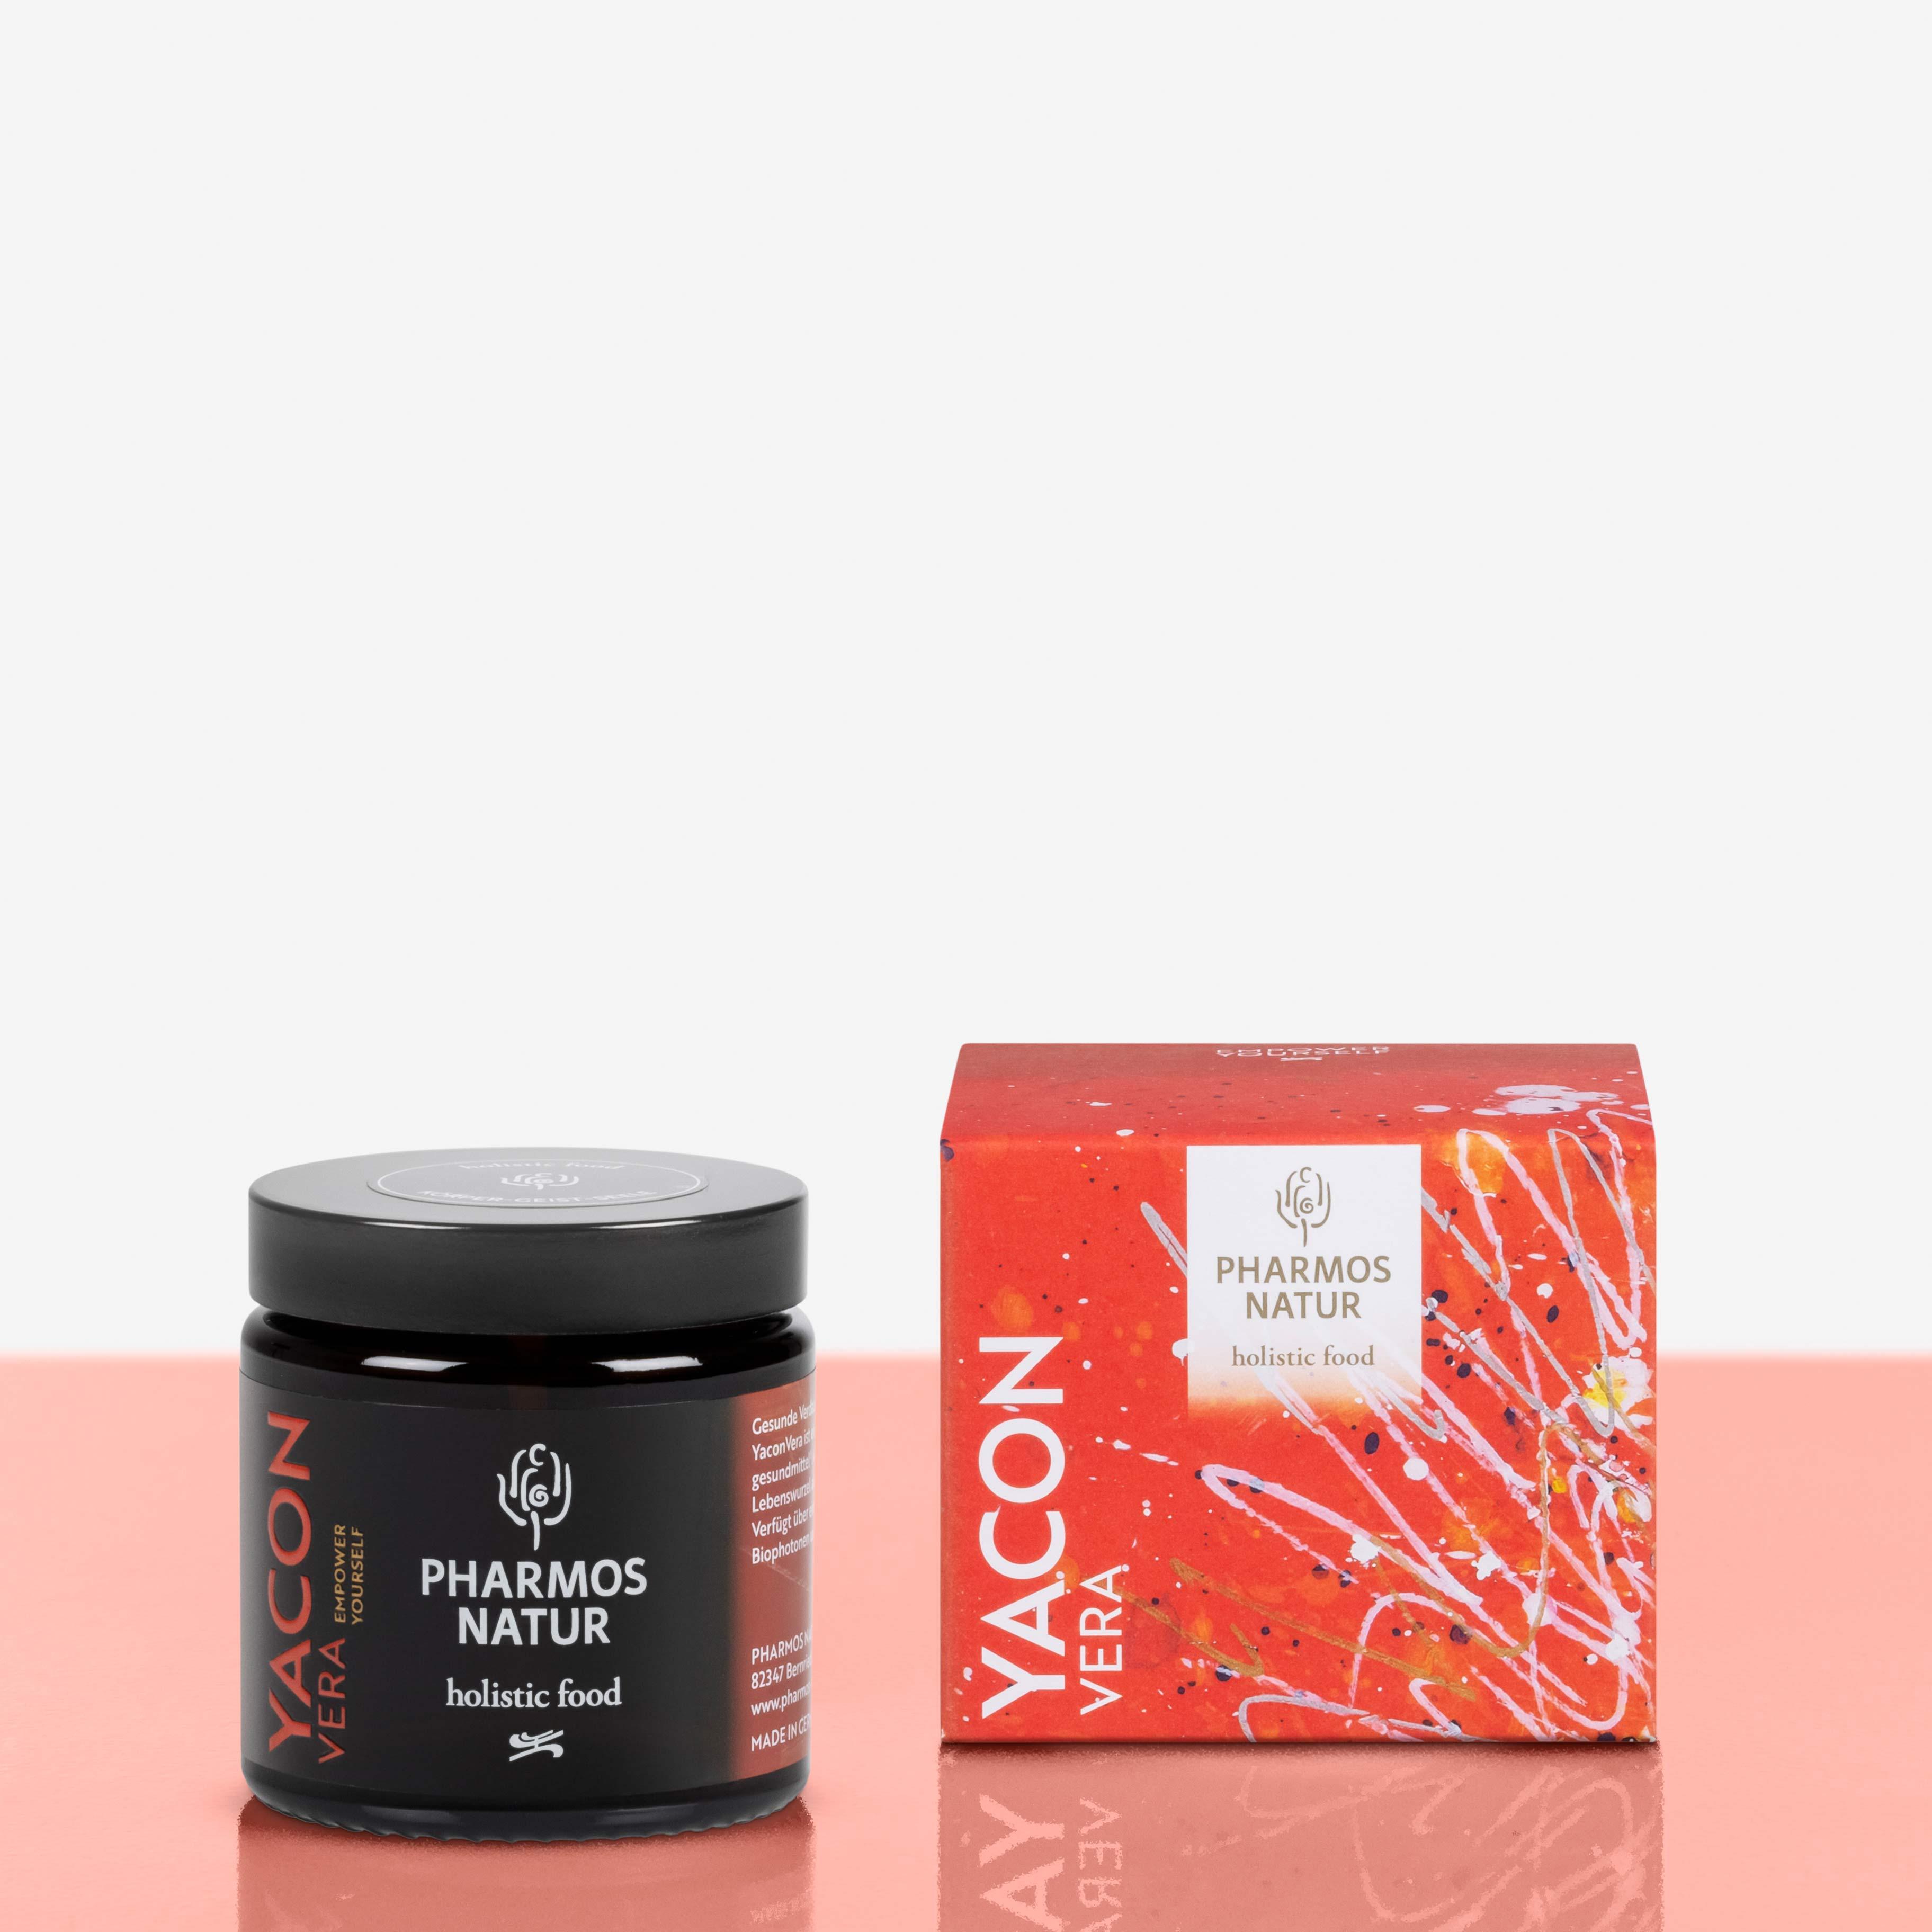 Yacon Vera dunkler Behälter neben roter Verpackung Produktbild